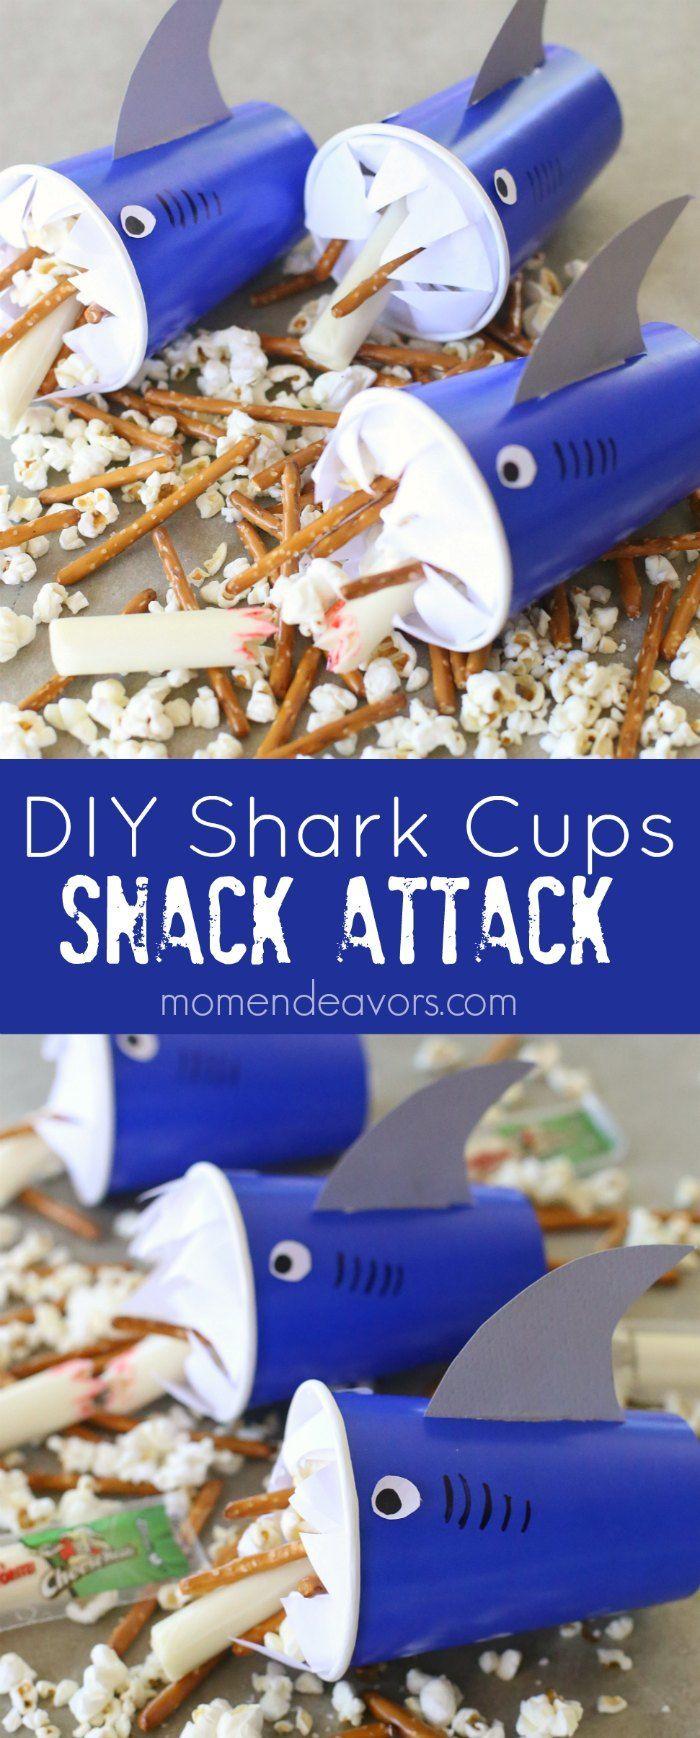 Snack Attack DIY Shark Cups - a fun shark craft & snack idea, perfect for Shark Week or a shark/ocean themed party!